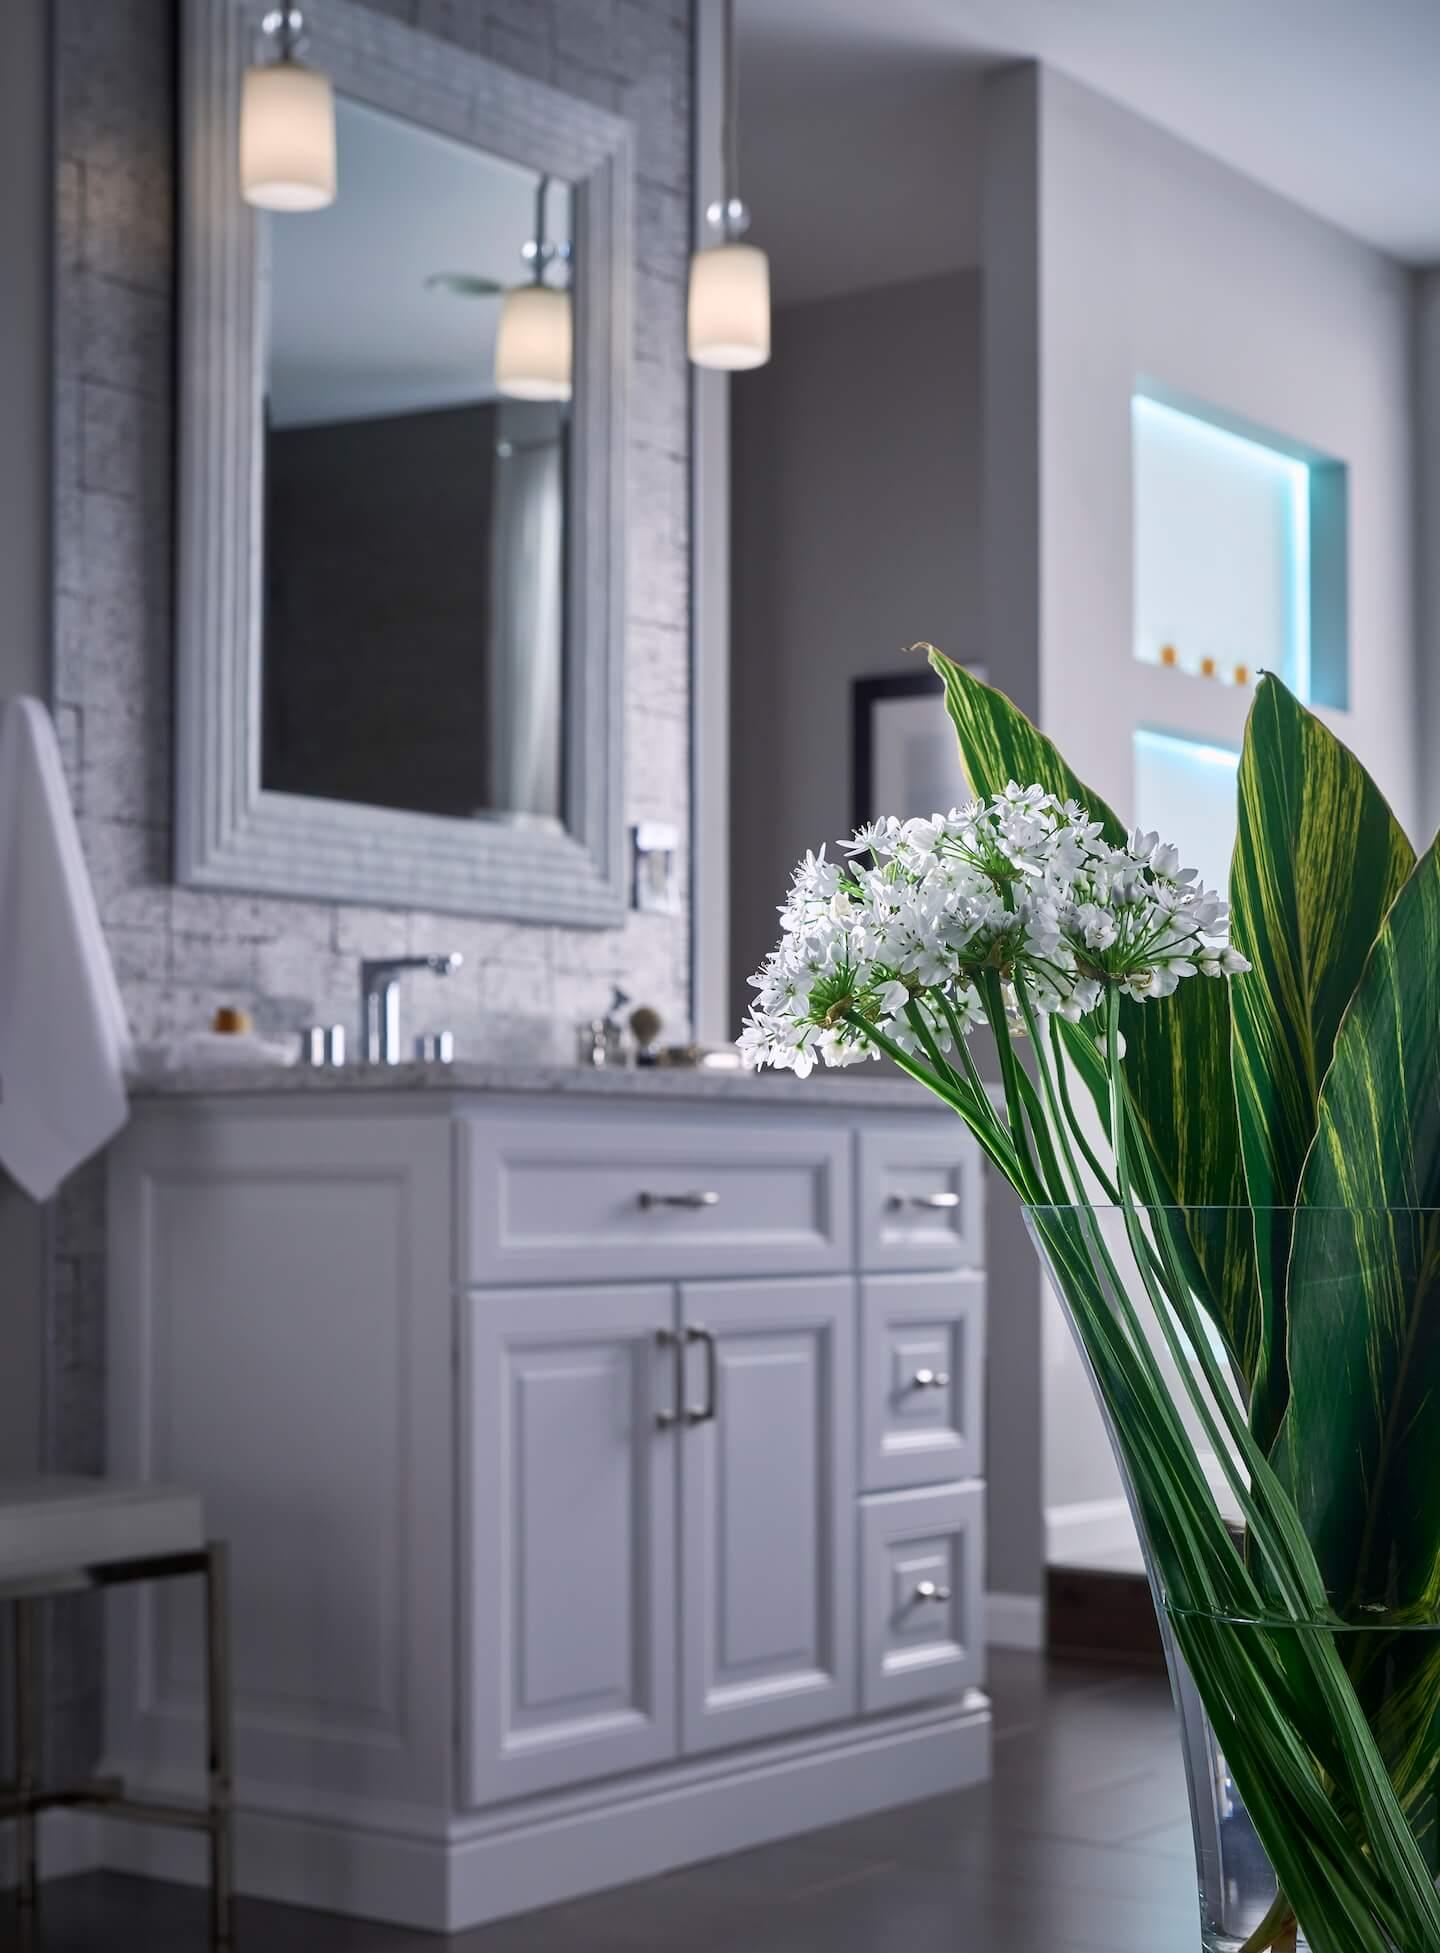 Wausau bathroom home remodeling contractors